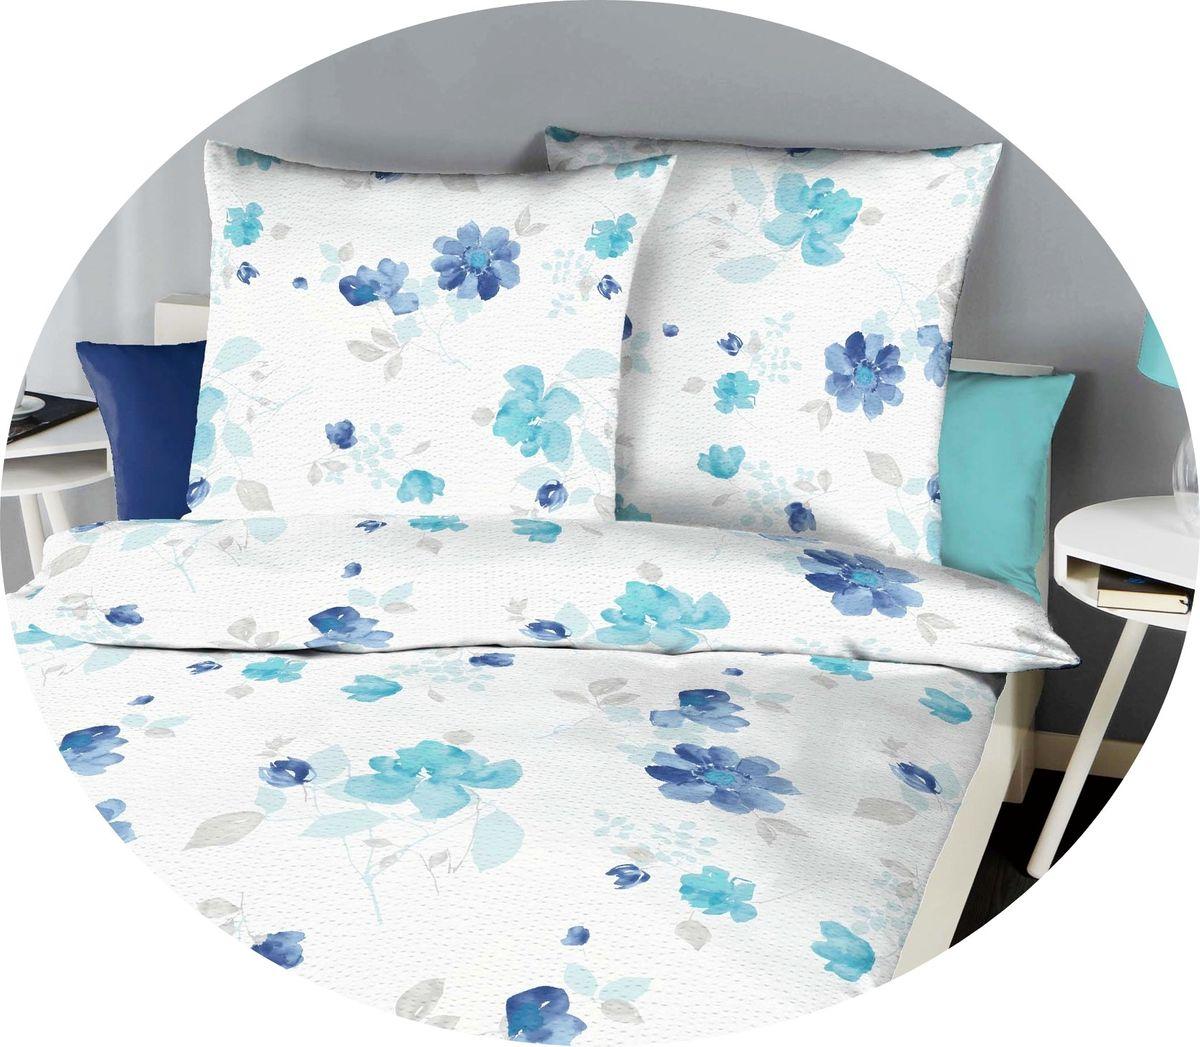 kaeppel edel seersucker bettw sche tender t rkis blau wei baumwolle 472 443 bettw sche. Black Bedroom Furniture Sets. Home Design Ideas